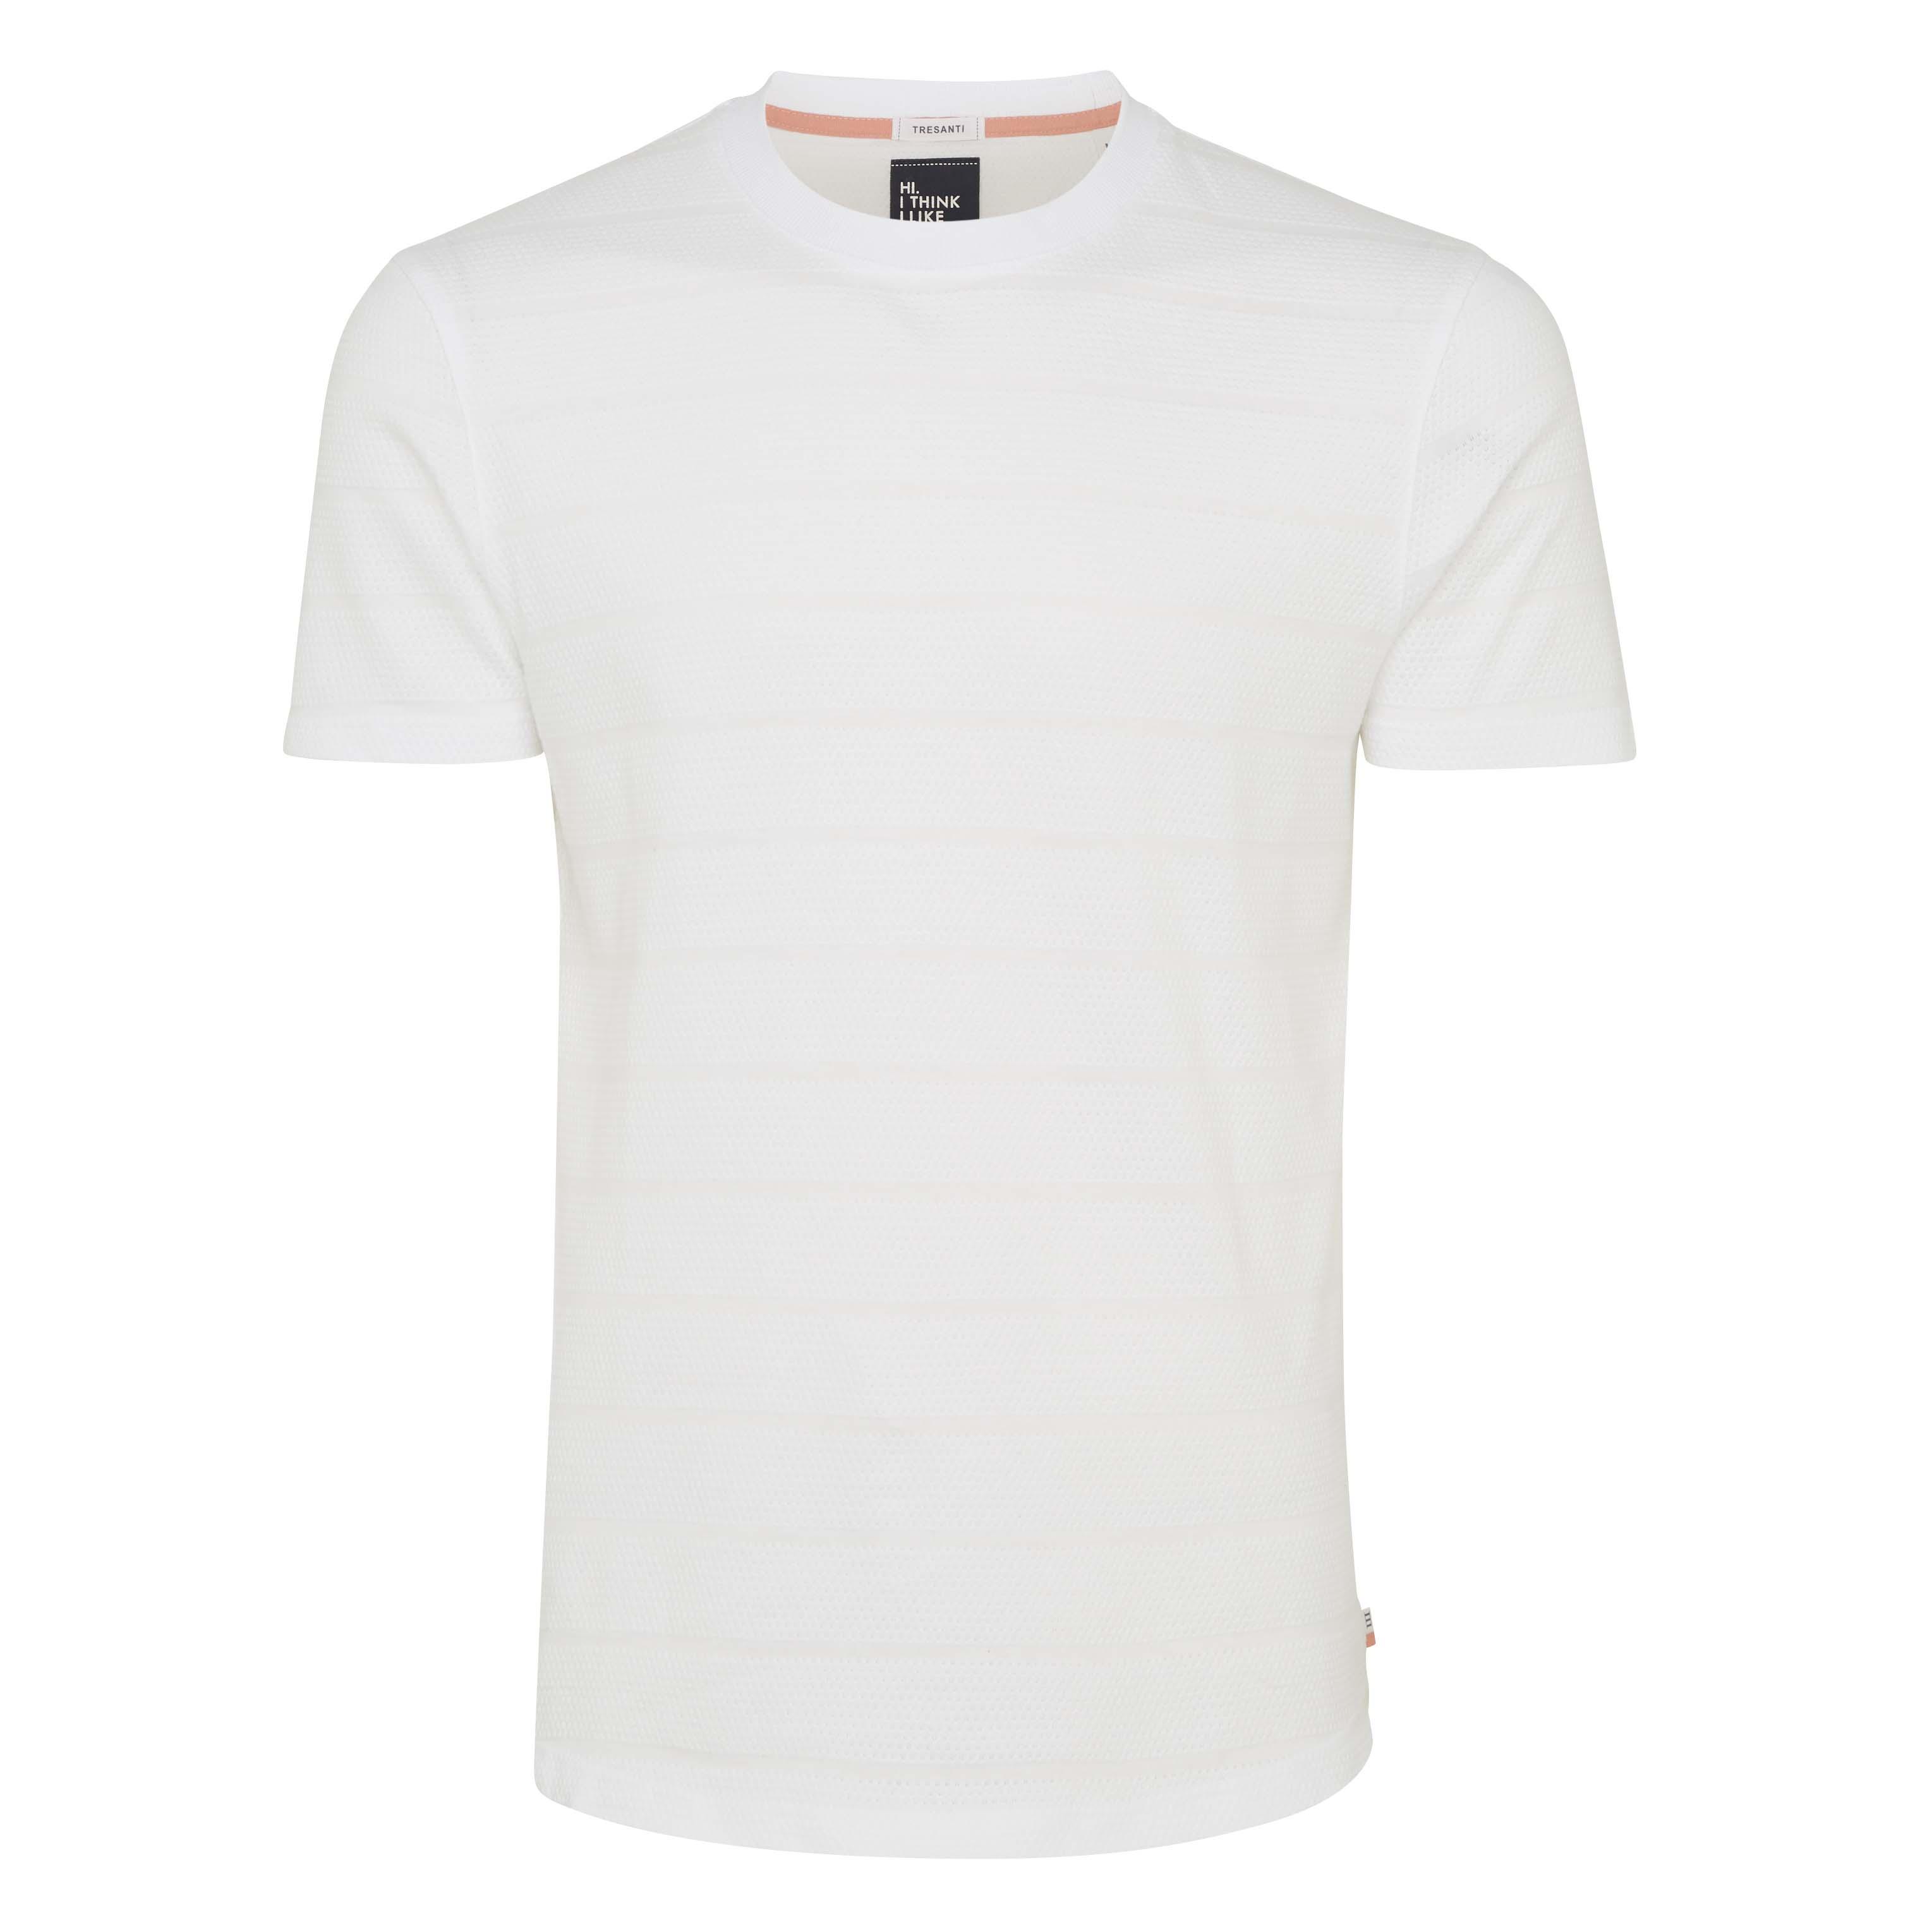 Tony | T-shirt structure white